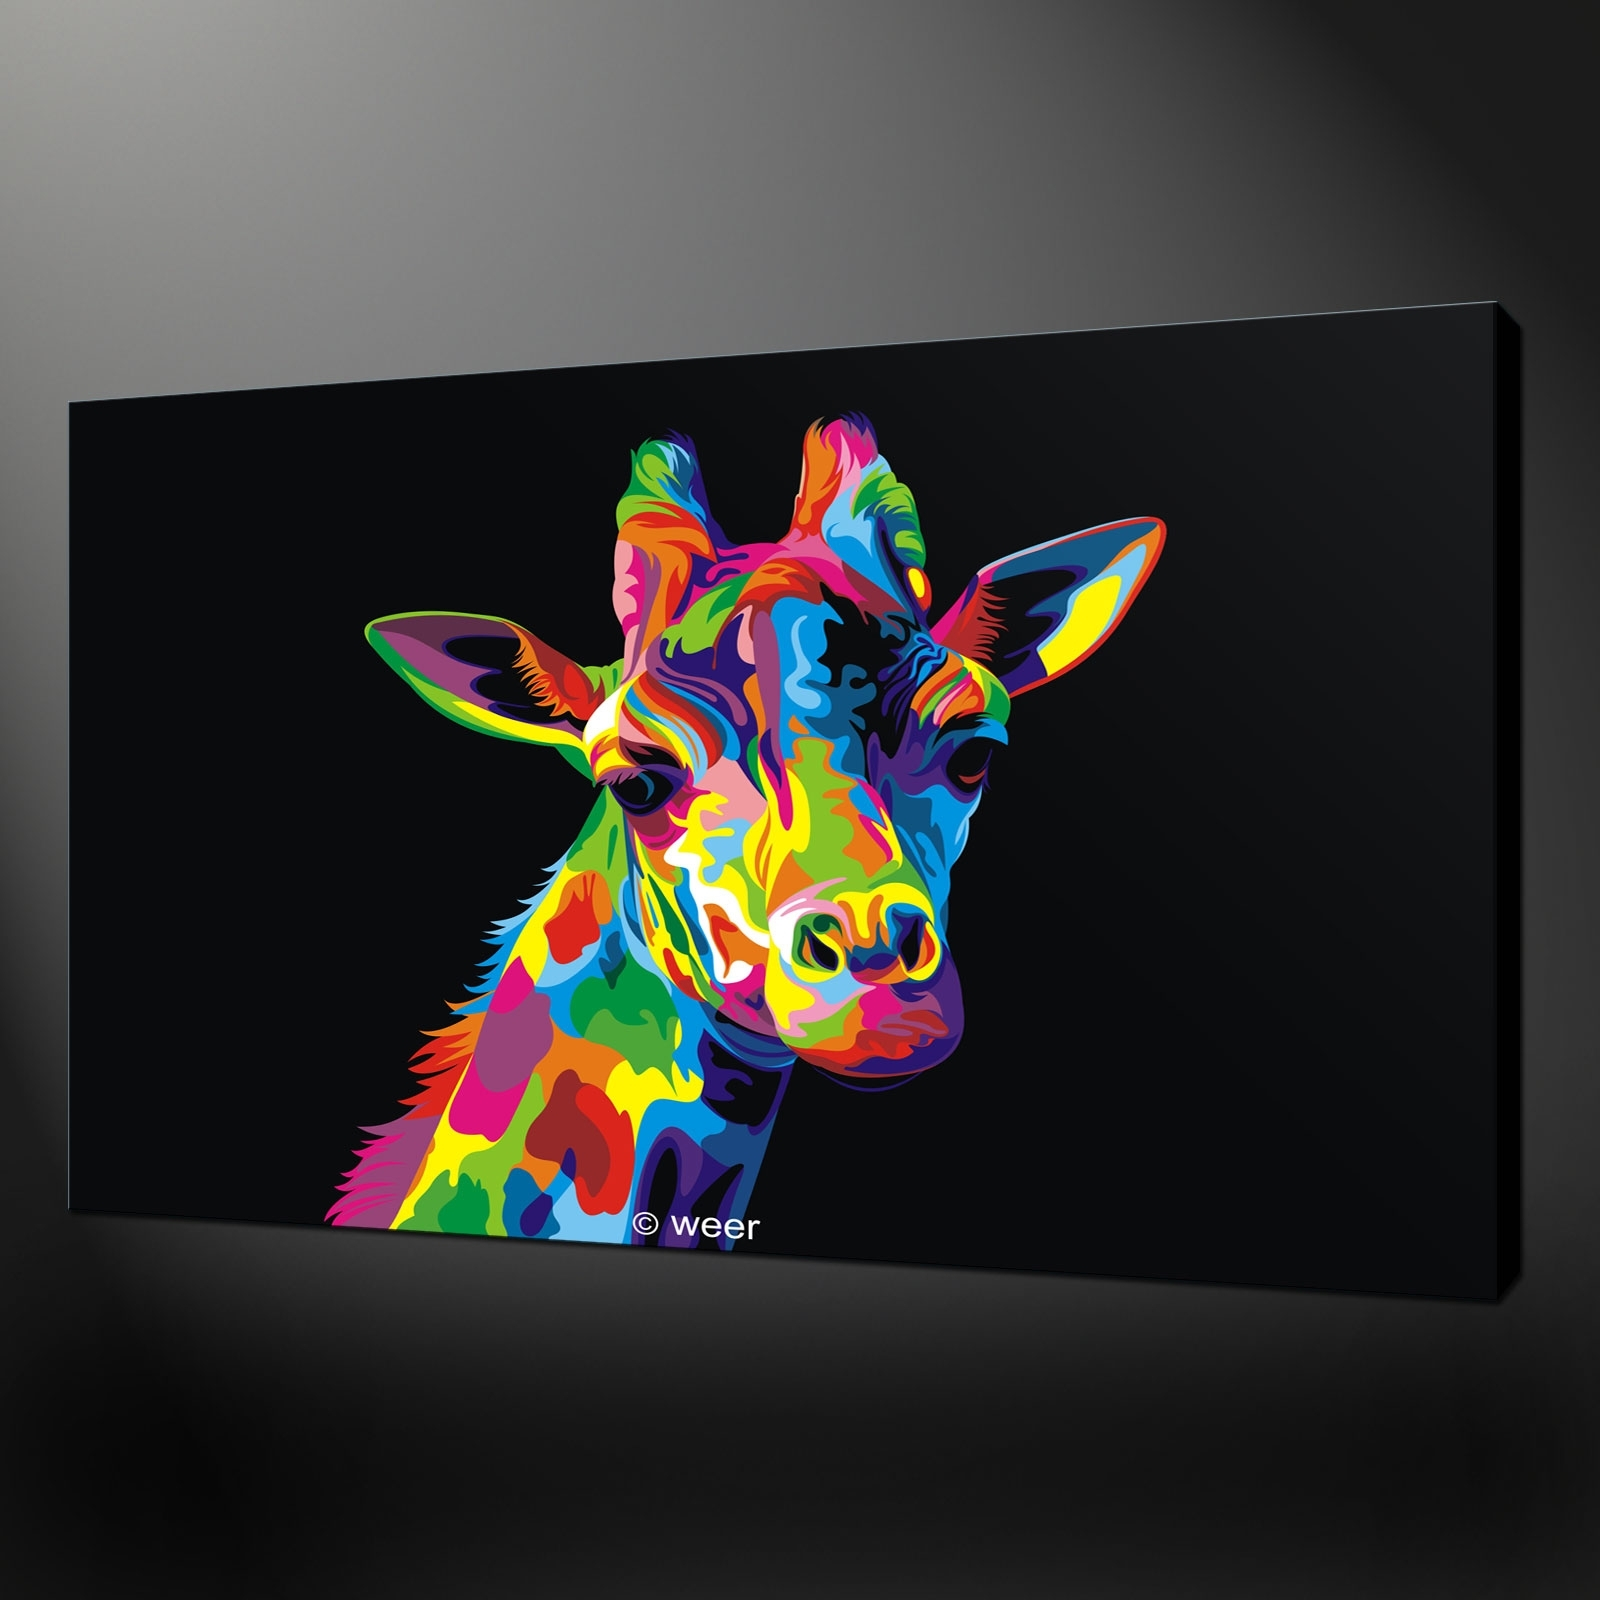 Abstract Giraffe Art, Giraffe Wall Art - Swinki Morskie within Giraffe Canvas Wall Art (Image 3 of 20)